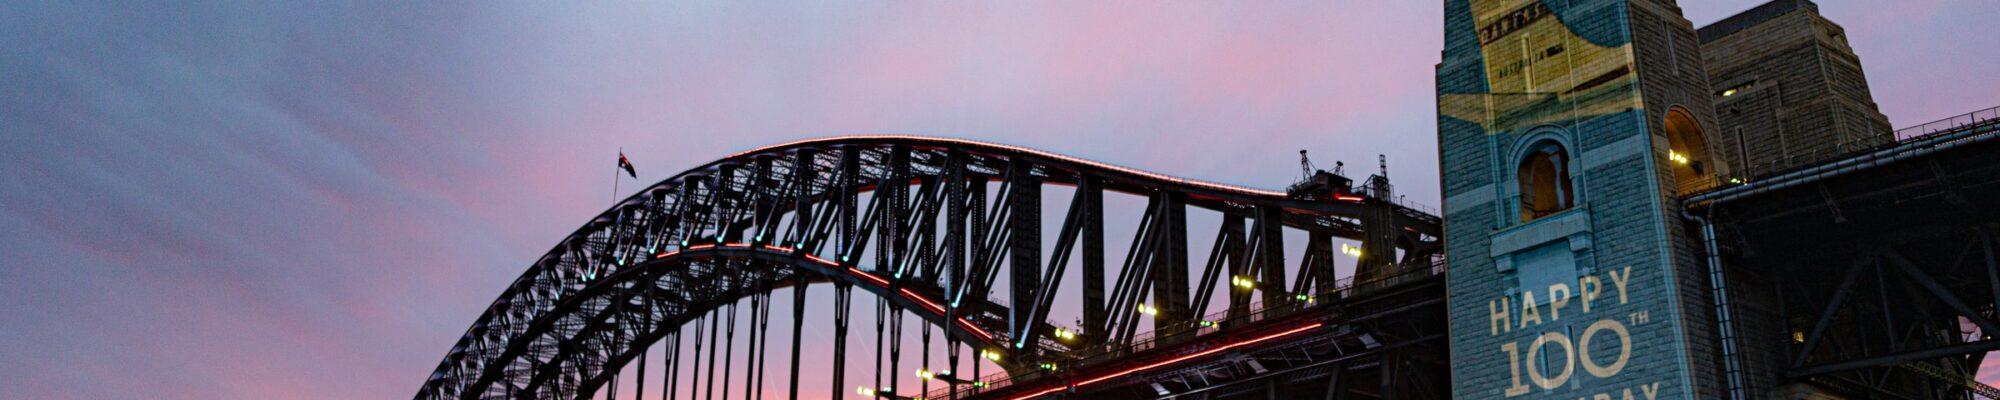 Australie Bridge